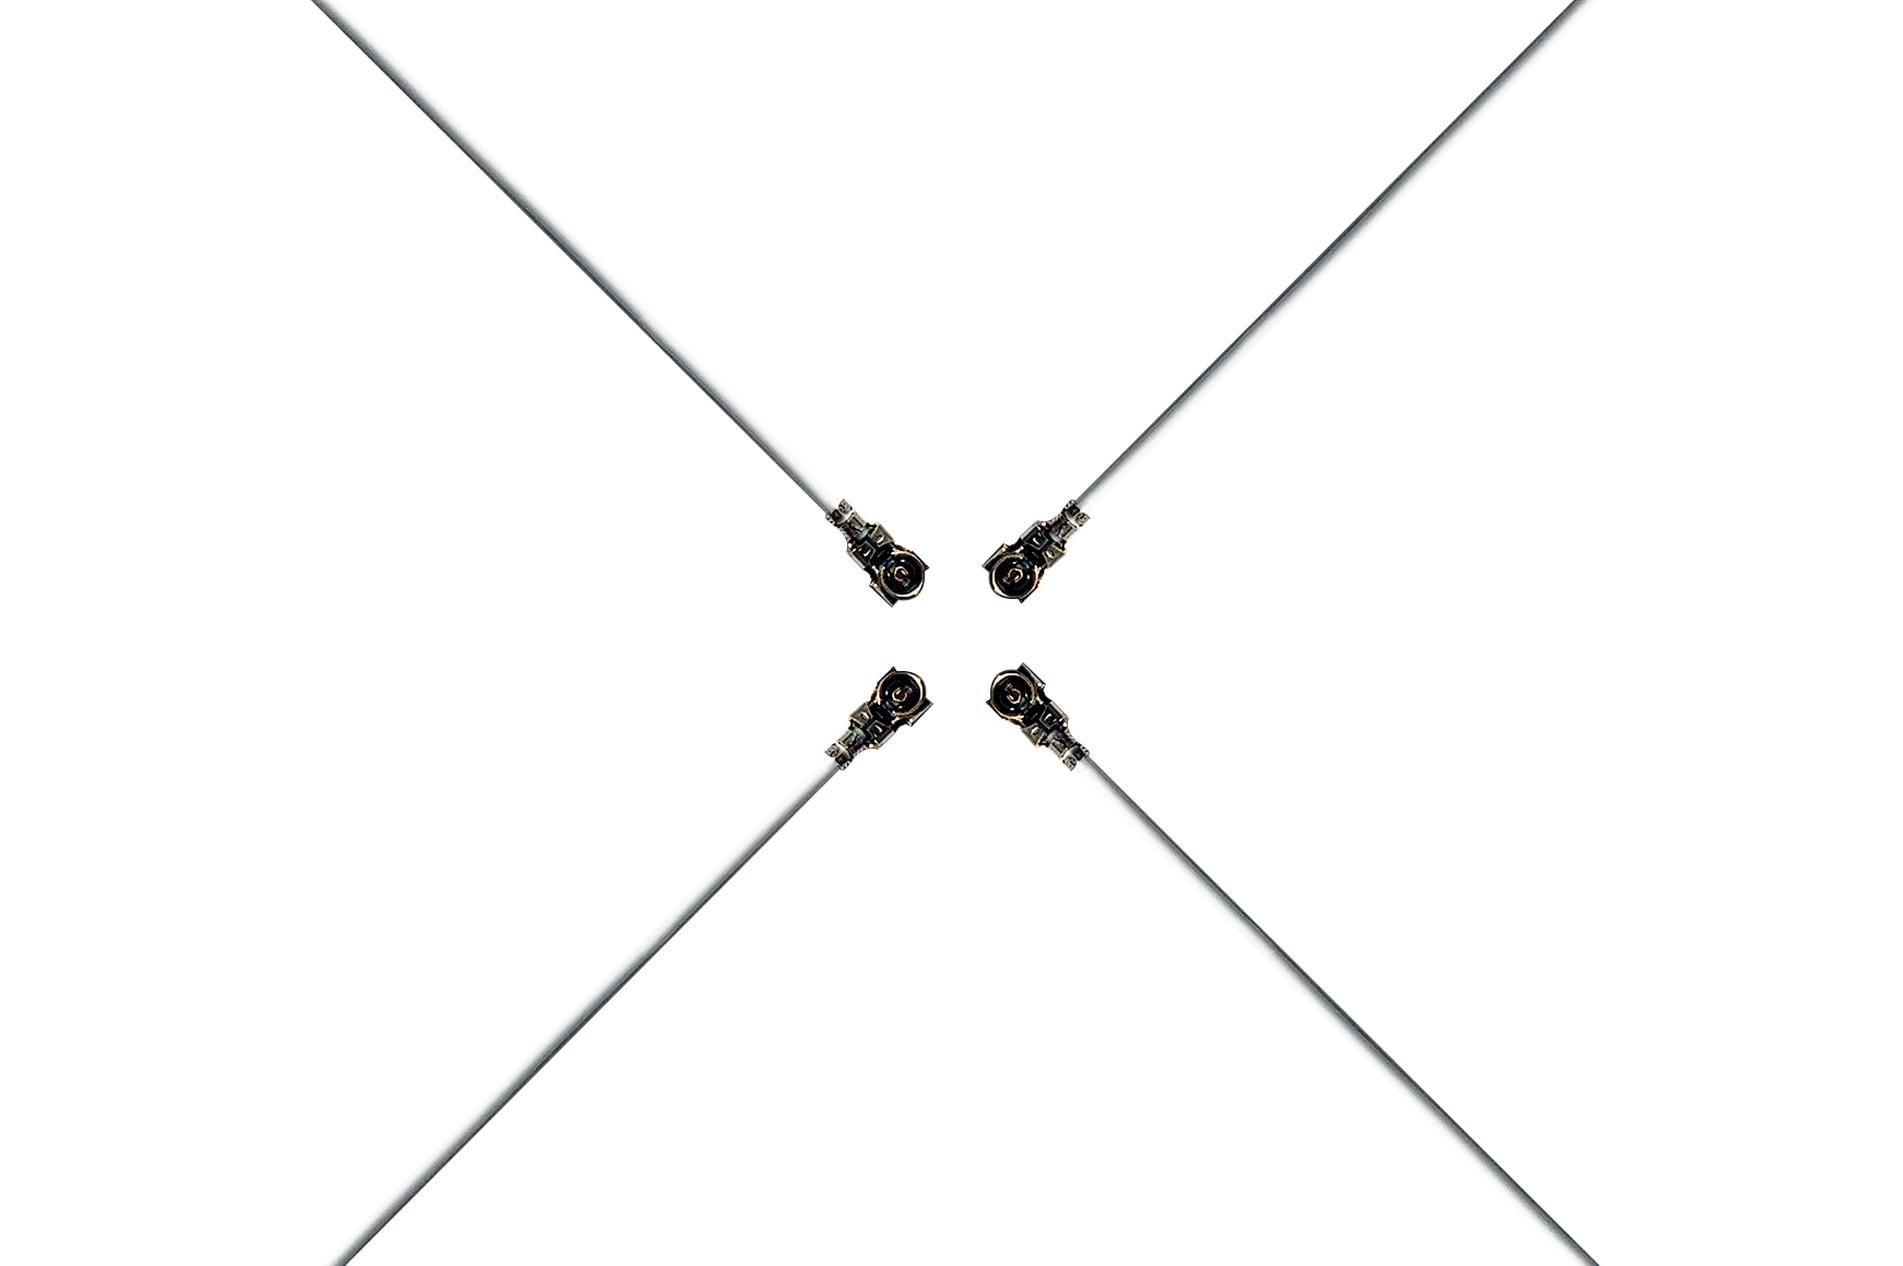 RF5代同轴线(0.64白色;L=137.2mm;双头同向)-7.041AJ